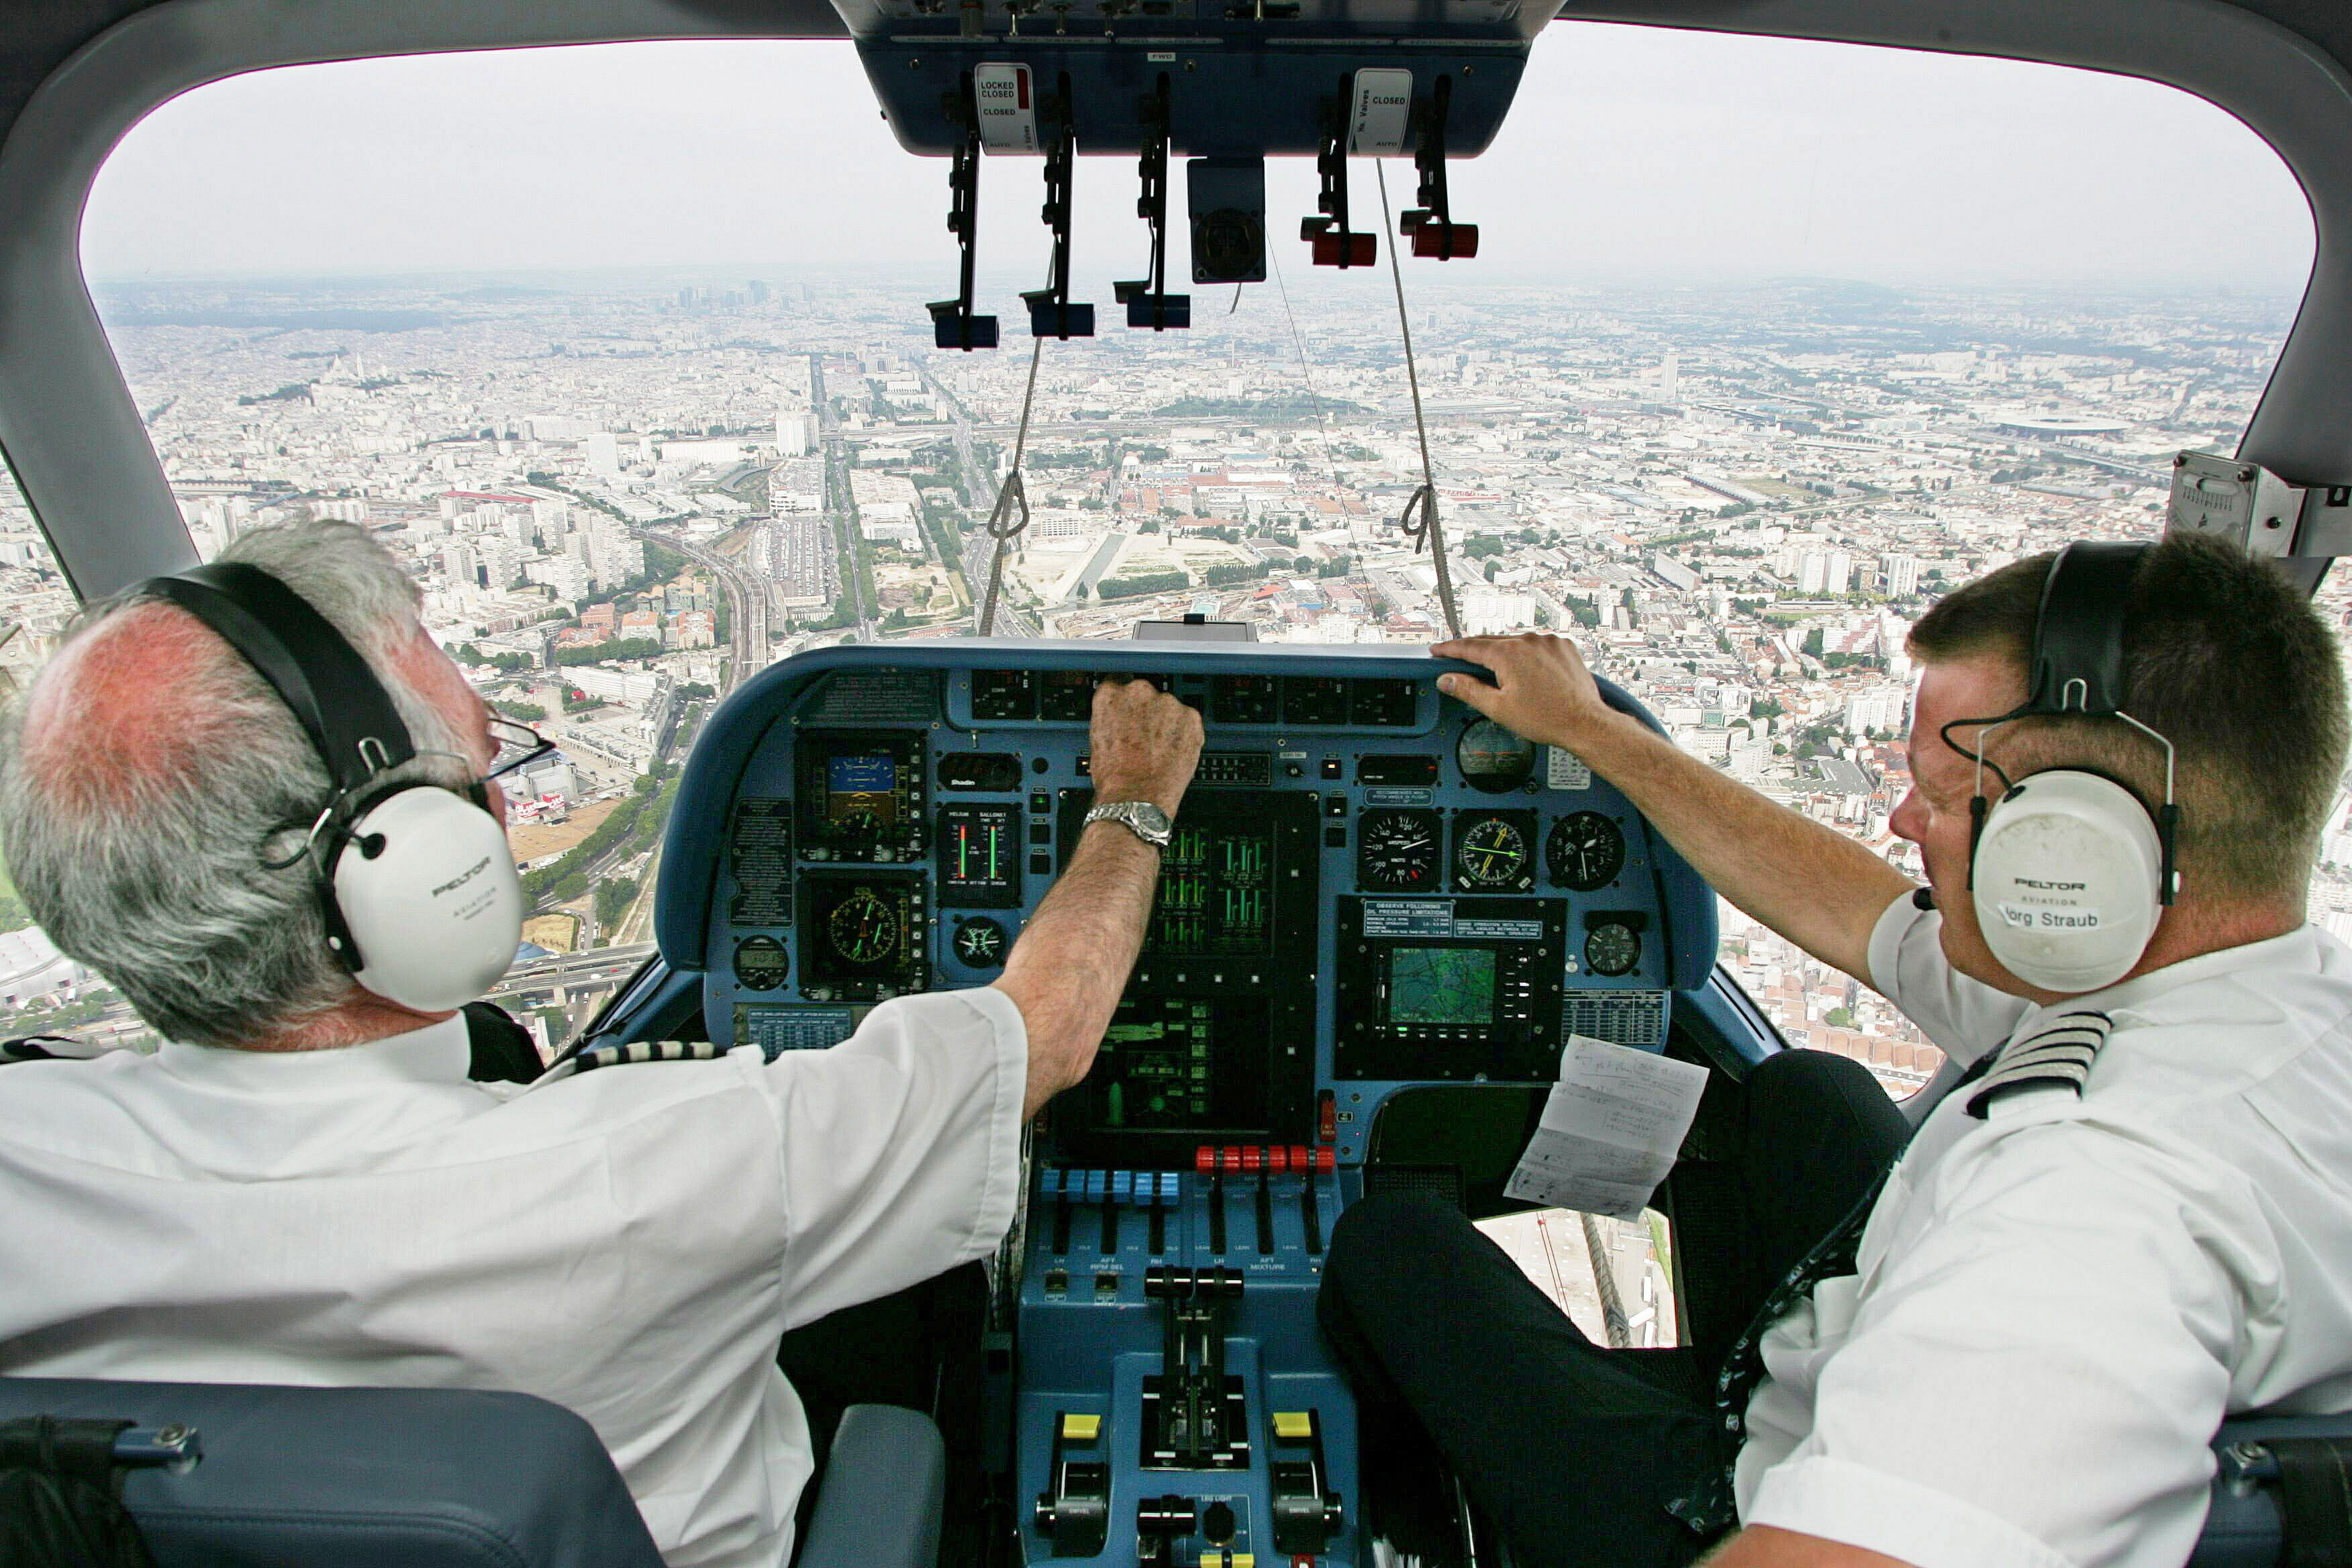 Les pilotes d'Air India ont vu des rats dans la cabine